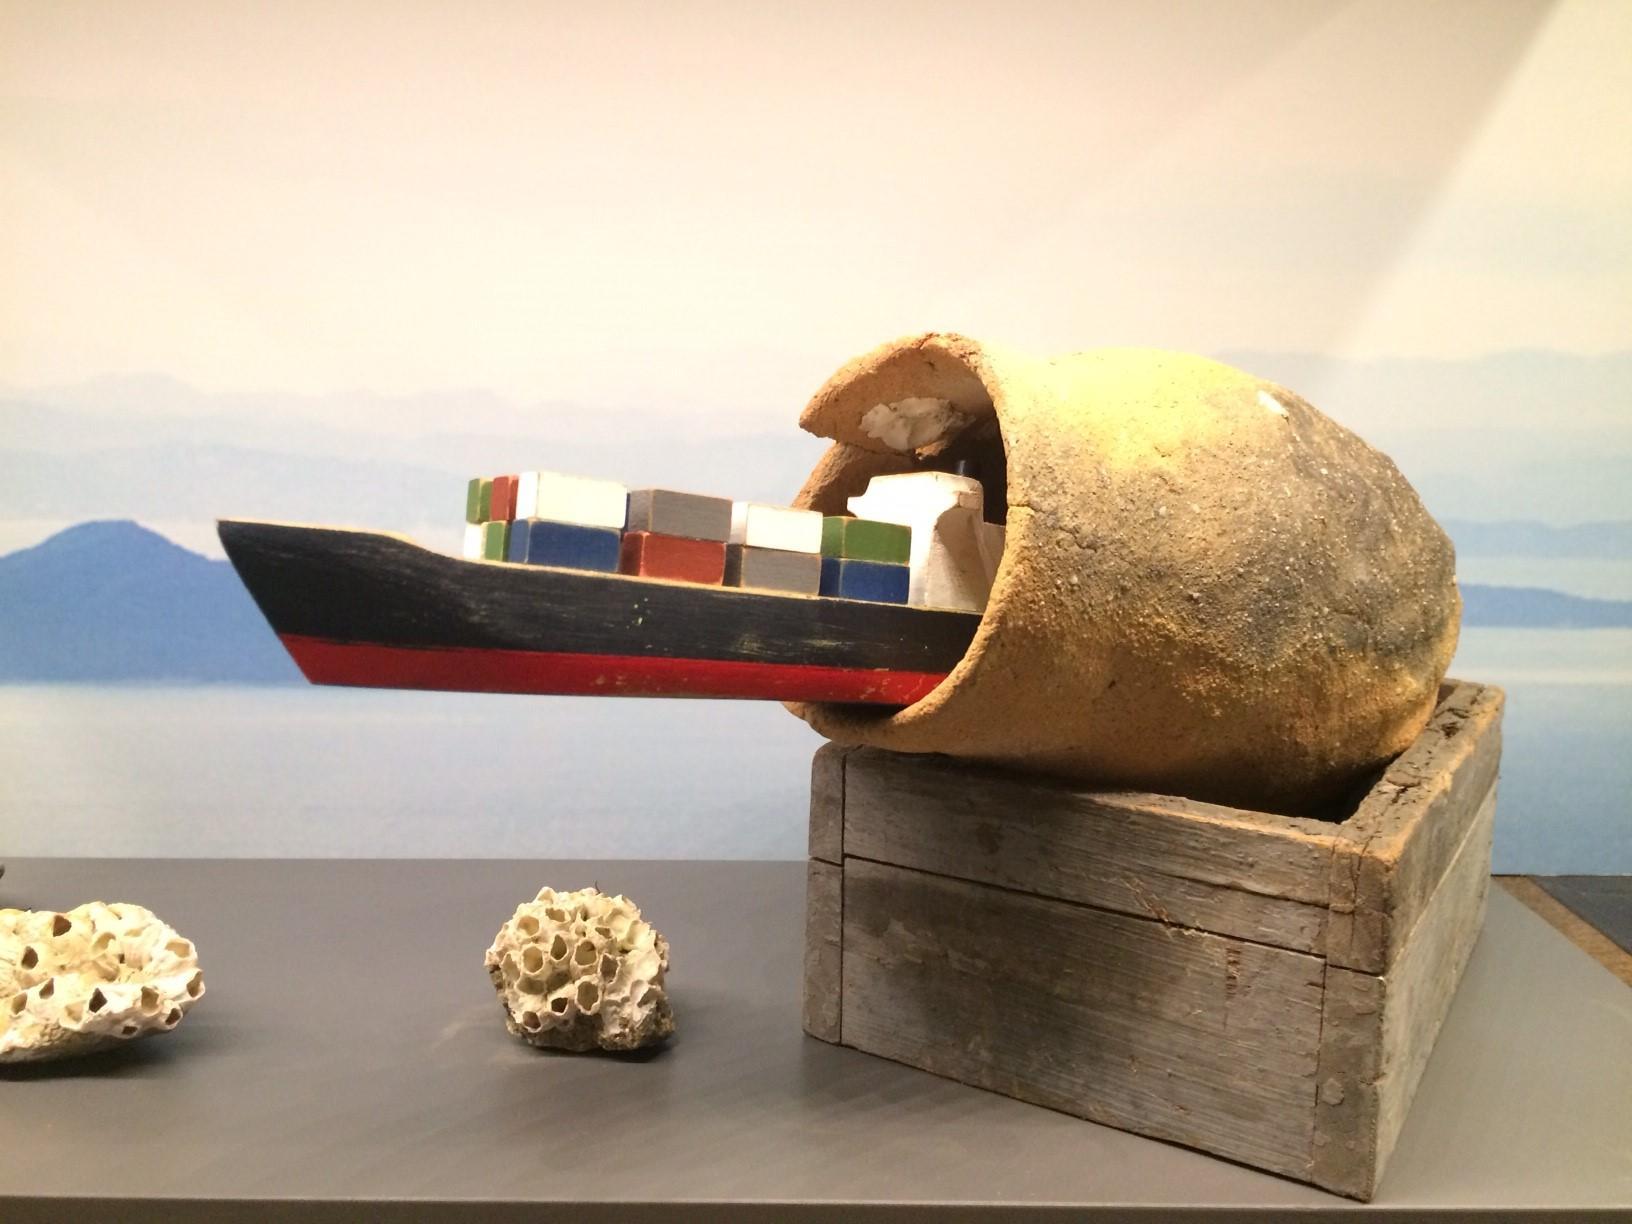 Bunpei Kado's latest works shown at Daikanyama T-site, Anjin